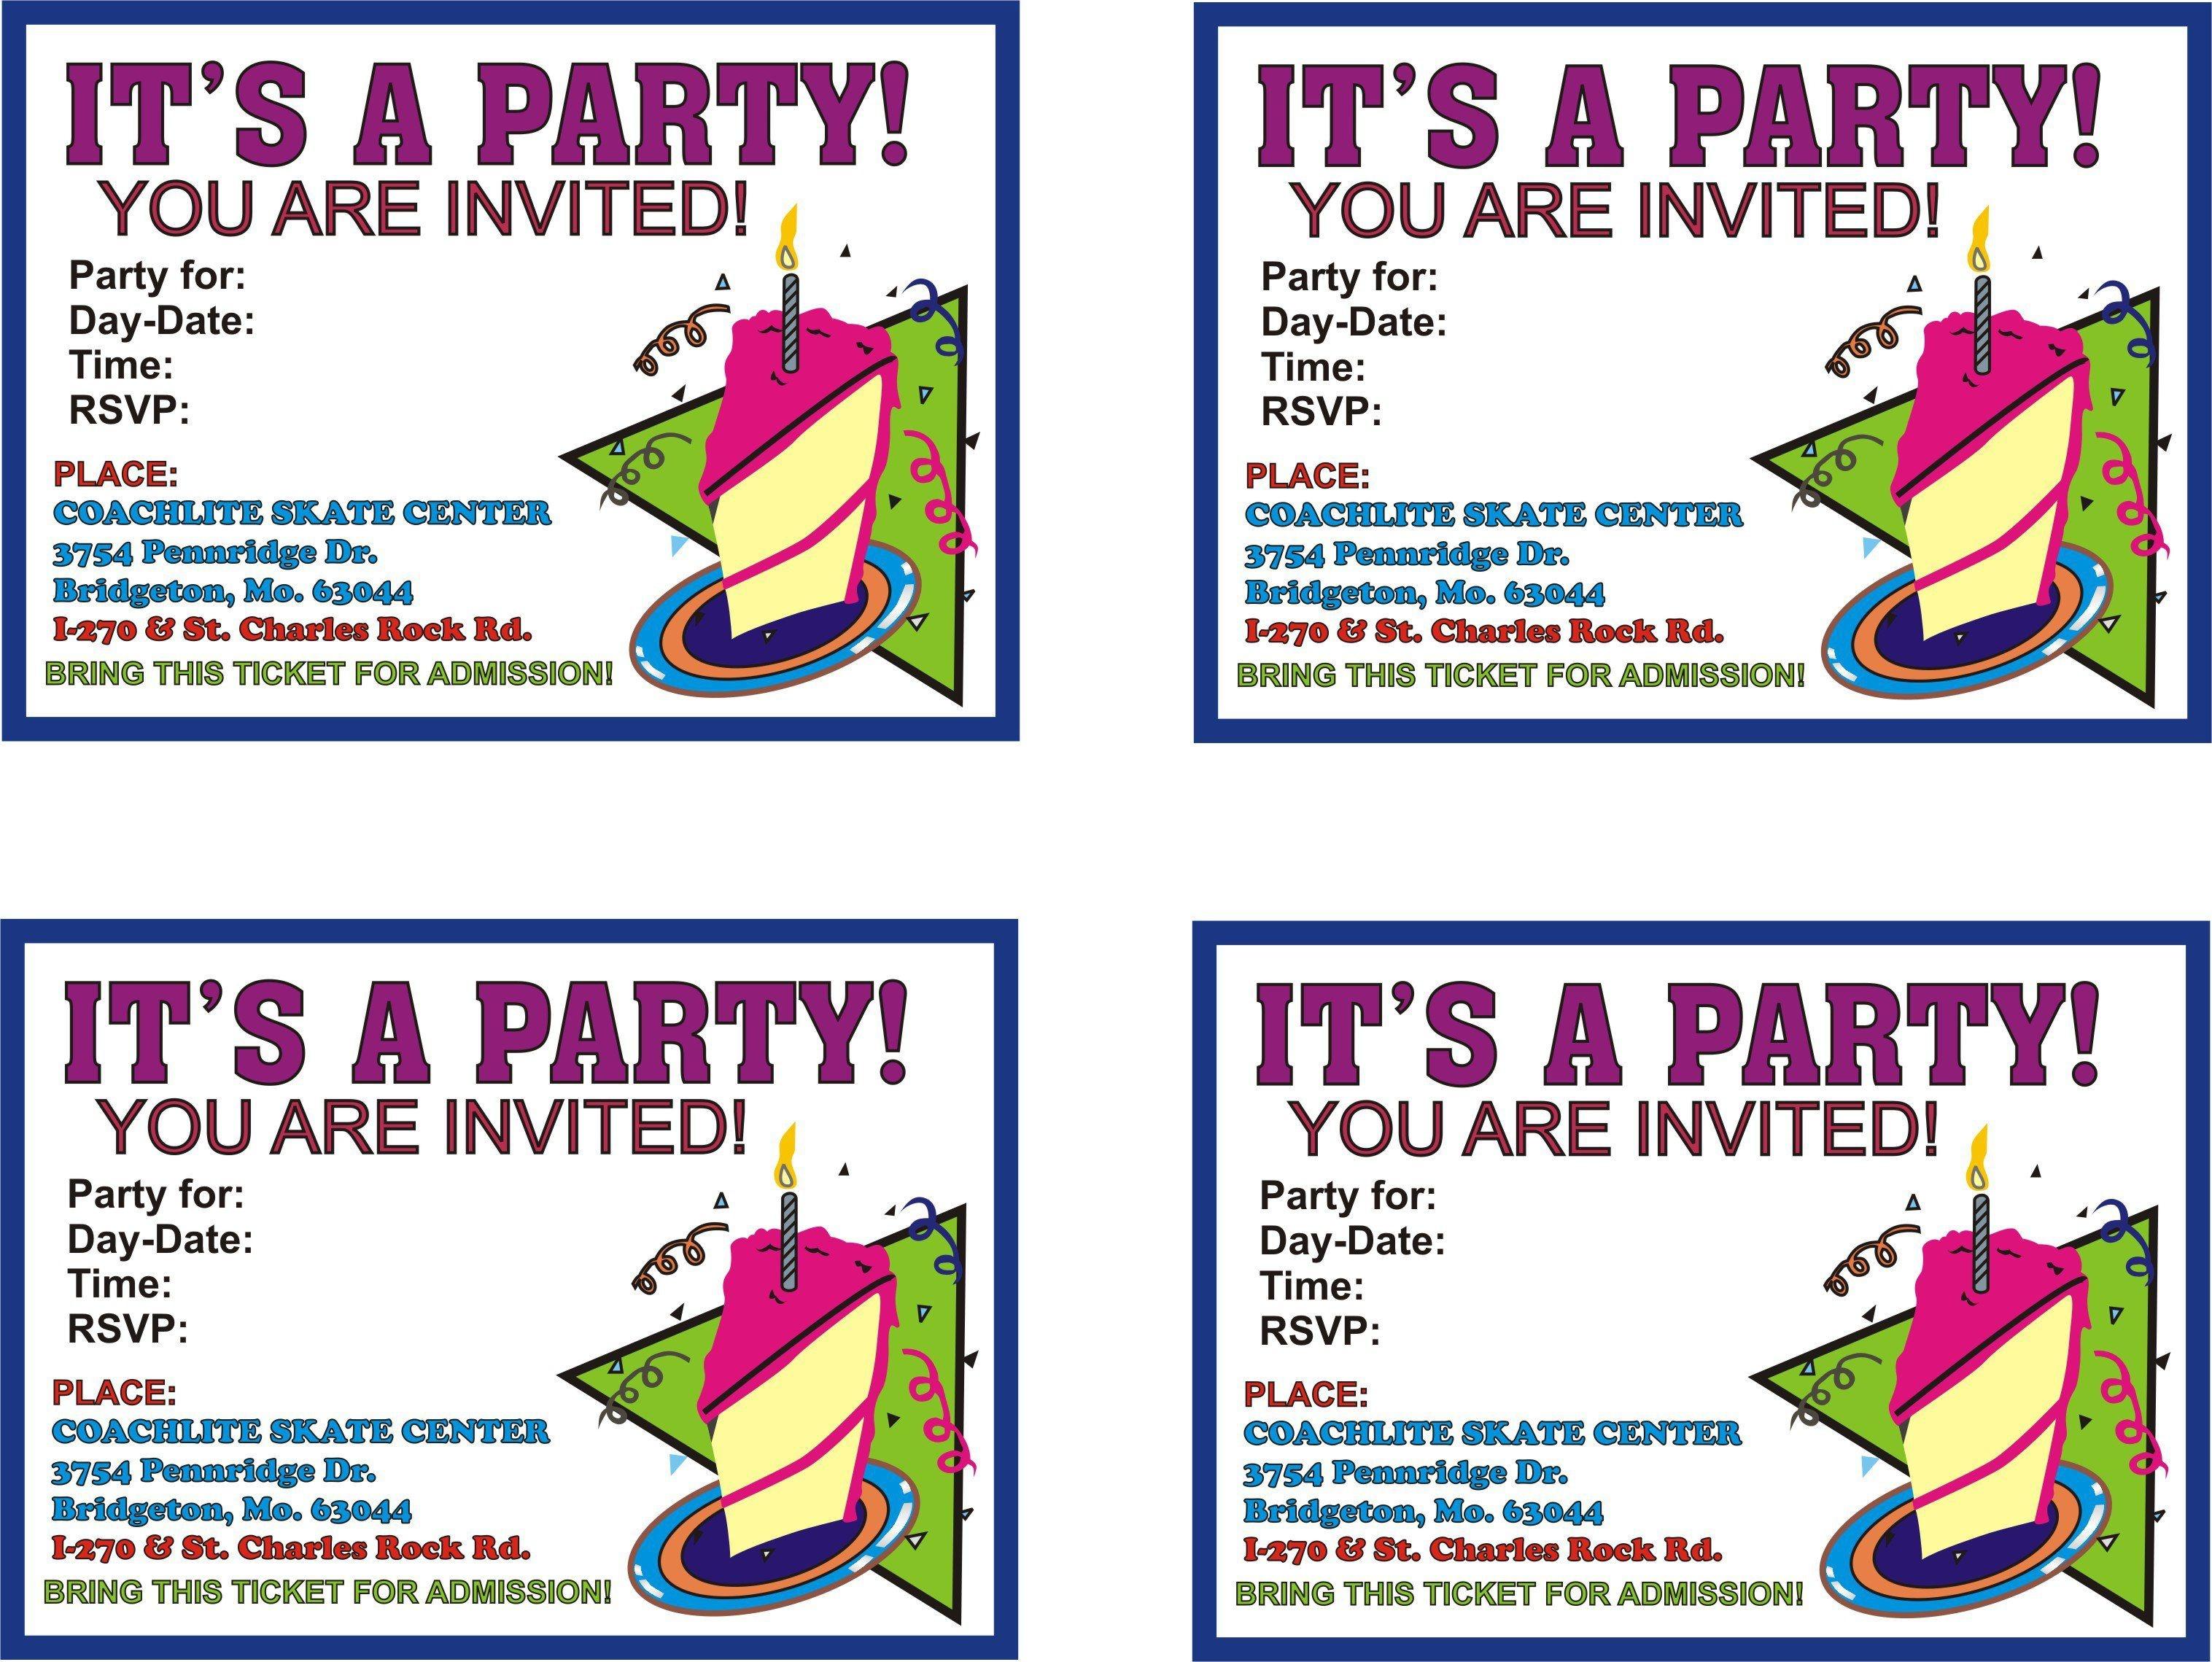 Print-Birthday-Invitations-Singapore | Birthday Invitations Template - Make Printable Party Invitations Online Free